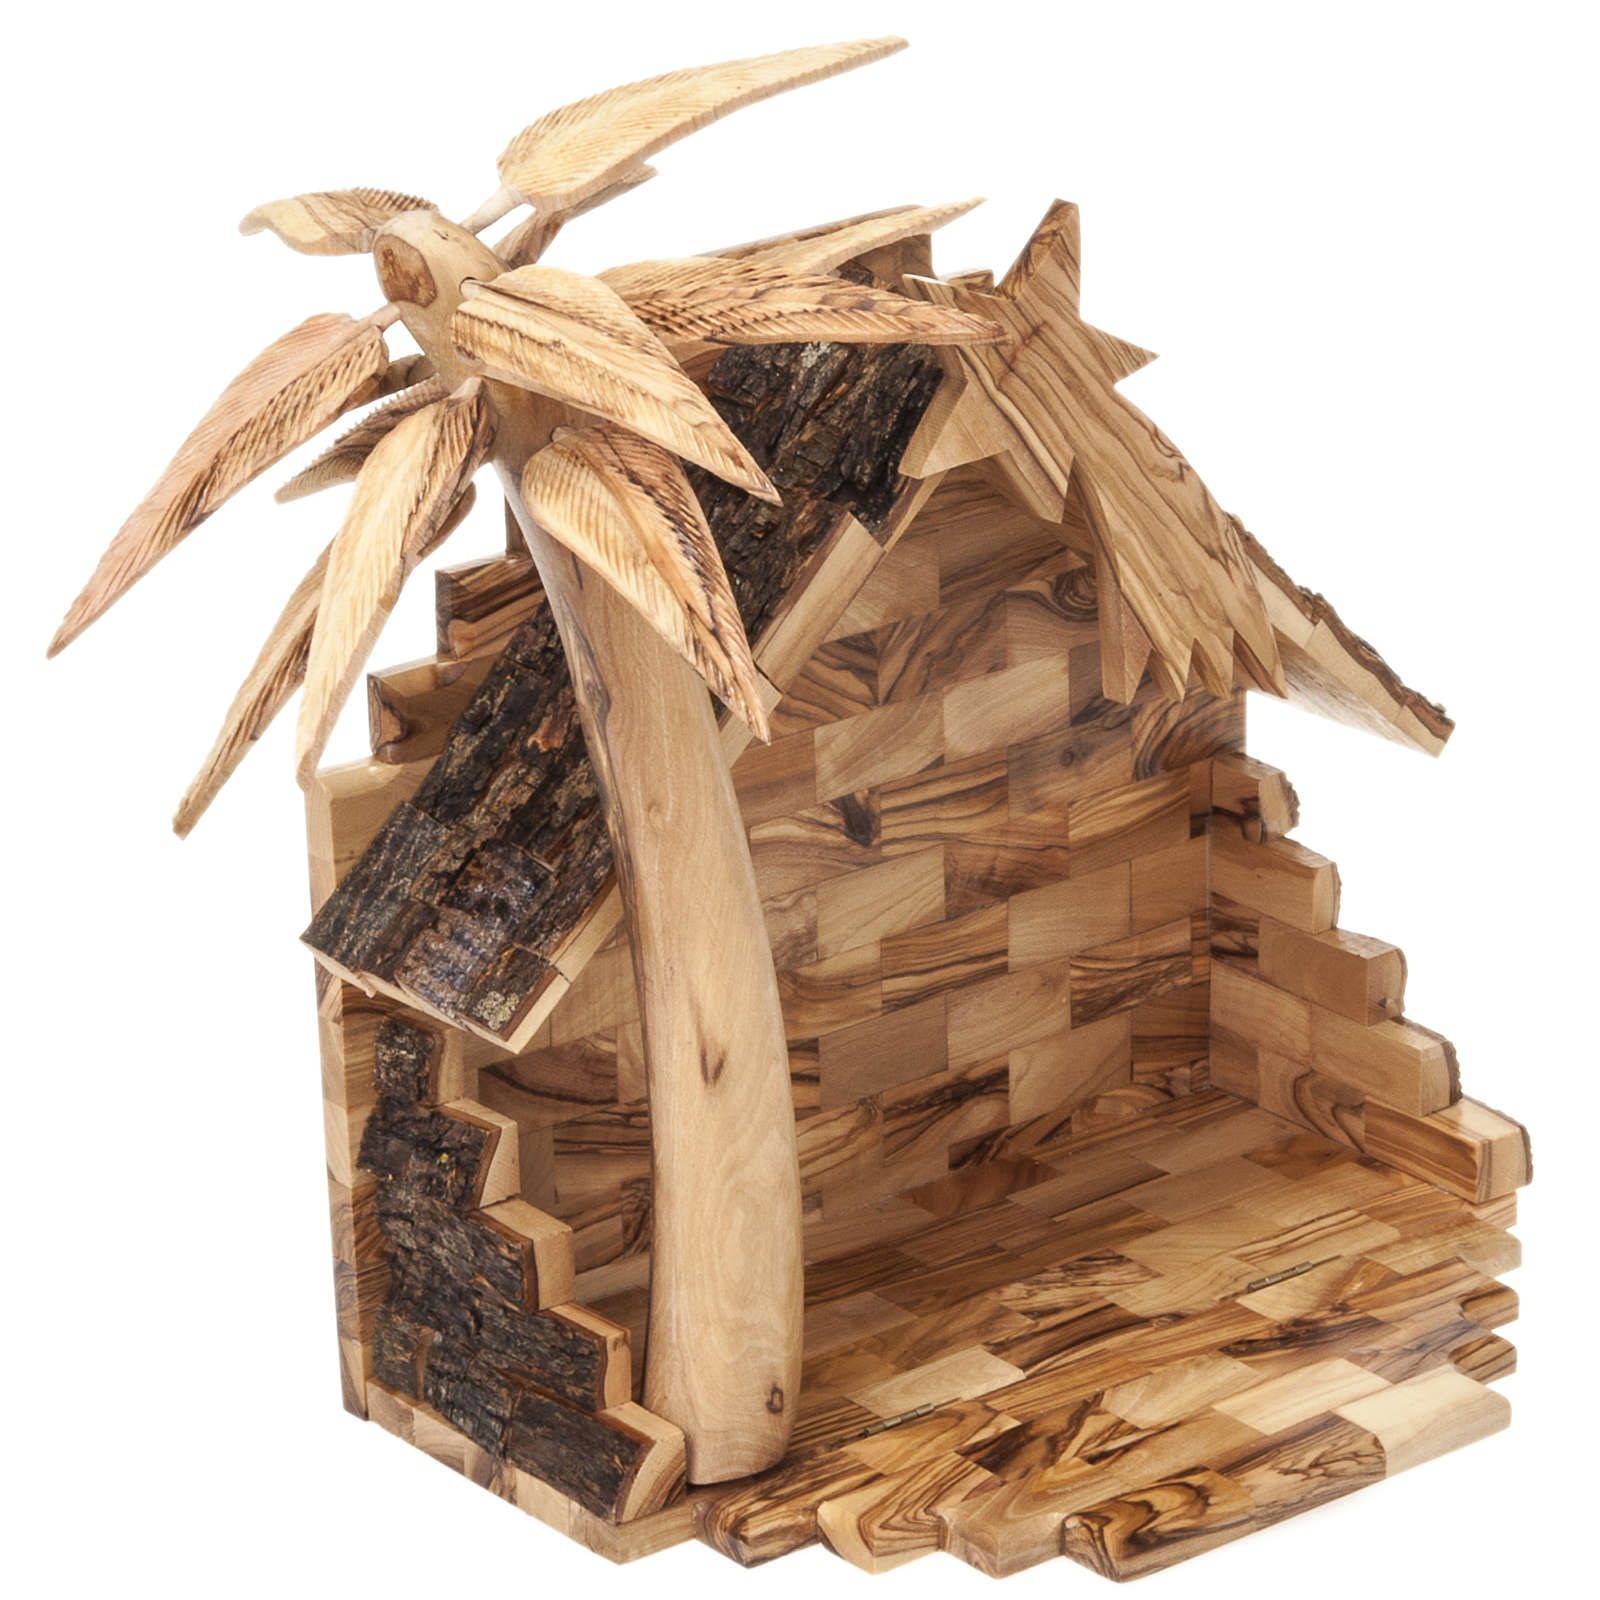 Szopka drewno oliwne Betlejem cm 14 4